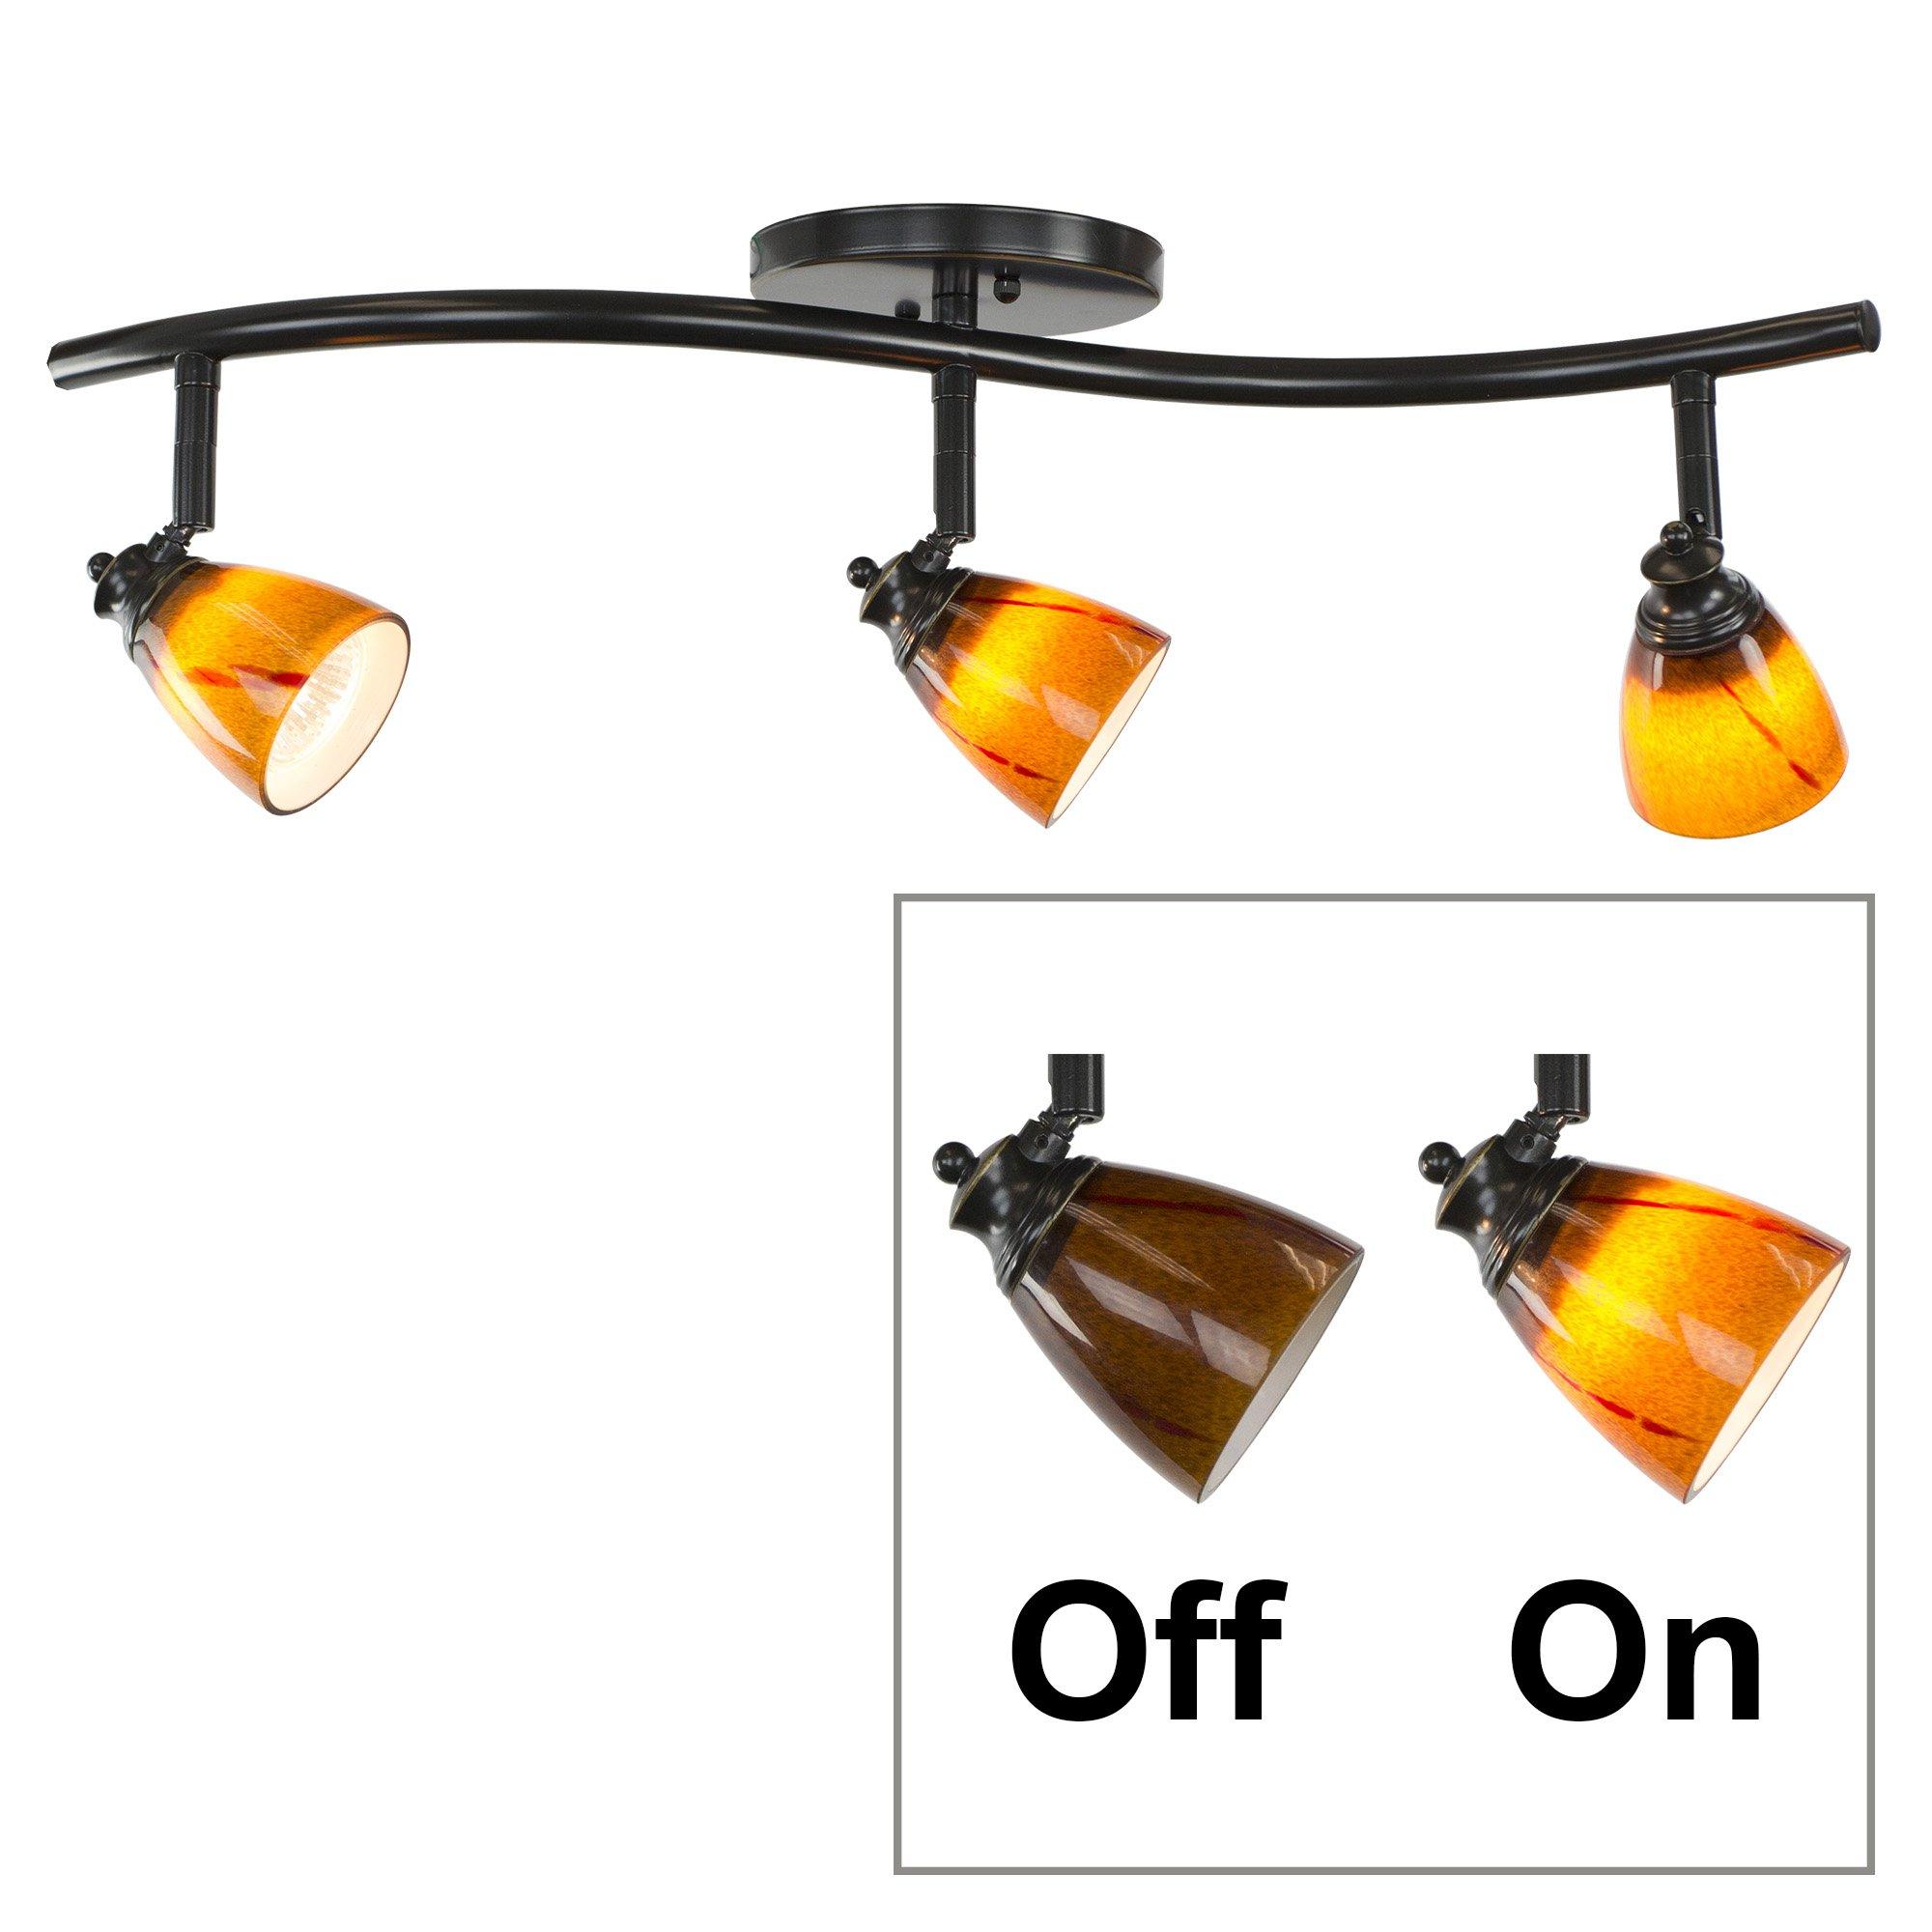 Direct-Lighting 3 Lights Adjustable Track Lighting Kit - Dark Bronze Finish - Amber Glass Track Heads - GU10 Bulbs Included. D268-23C-DB-AMS